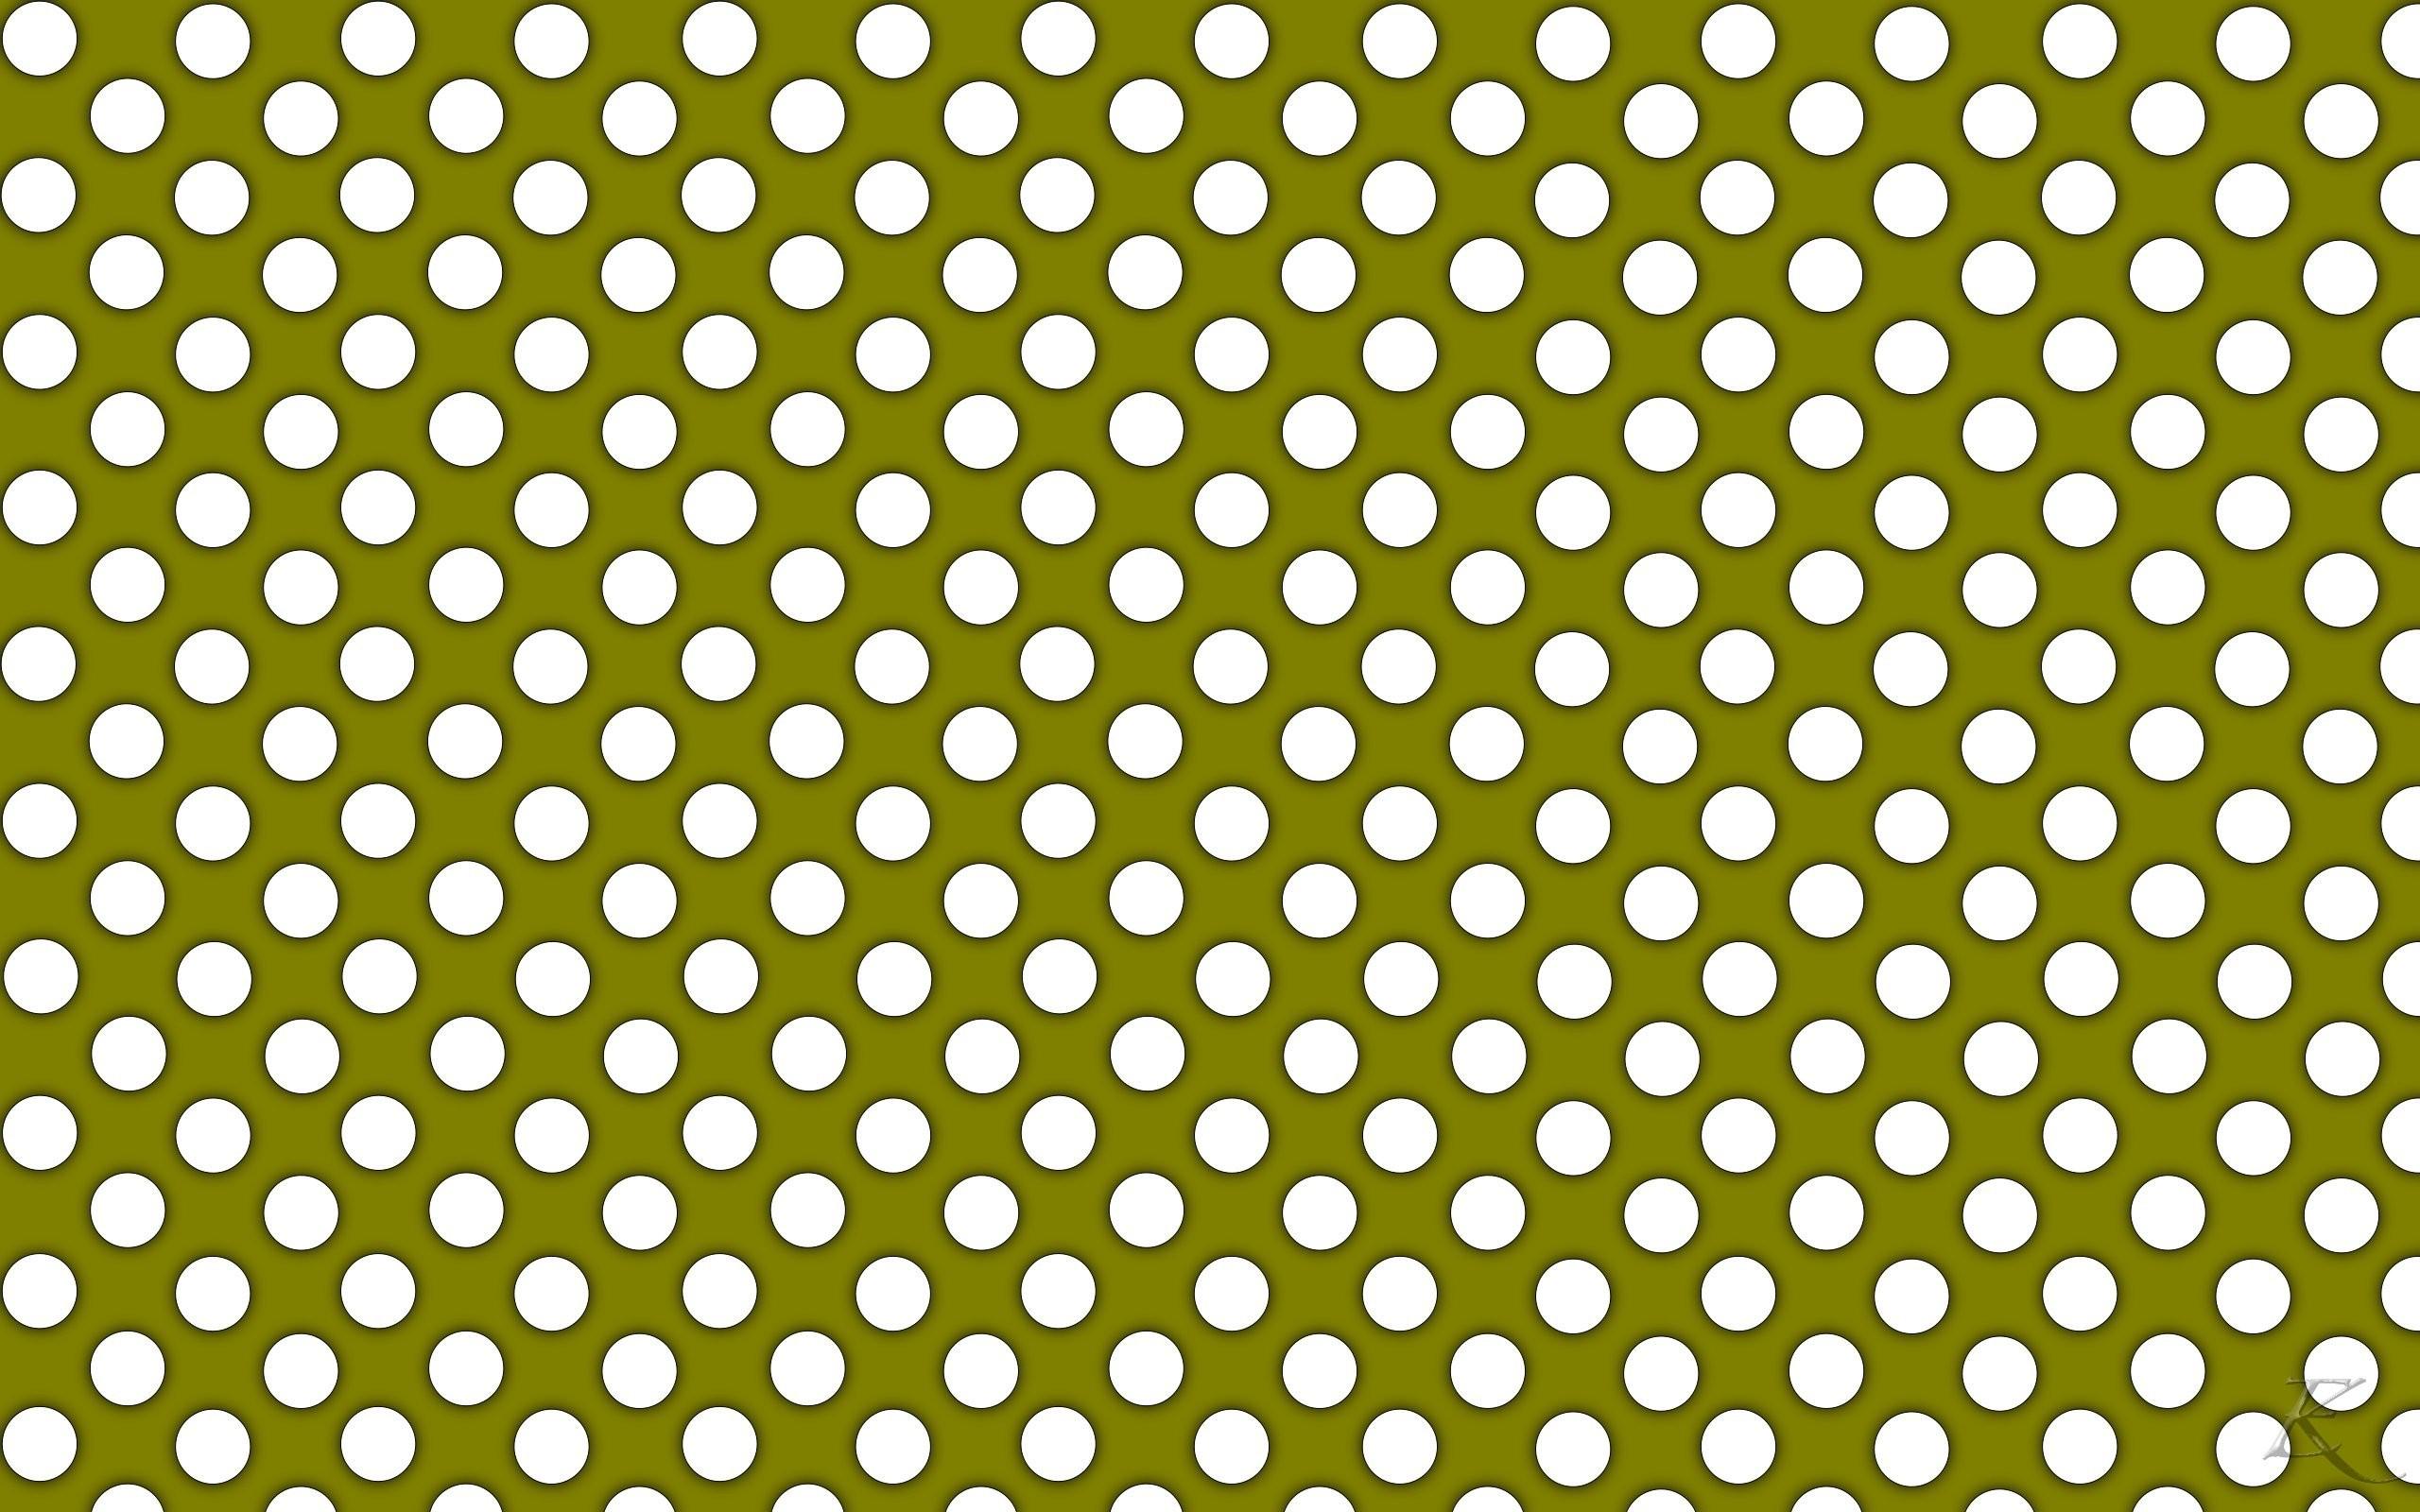 Cute Shelf Wallpaper For Ipad Polka Dot Wallpaper 183 ① Download Free Cool High Resolution